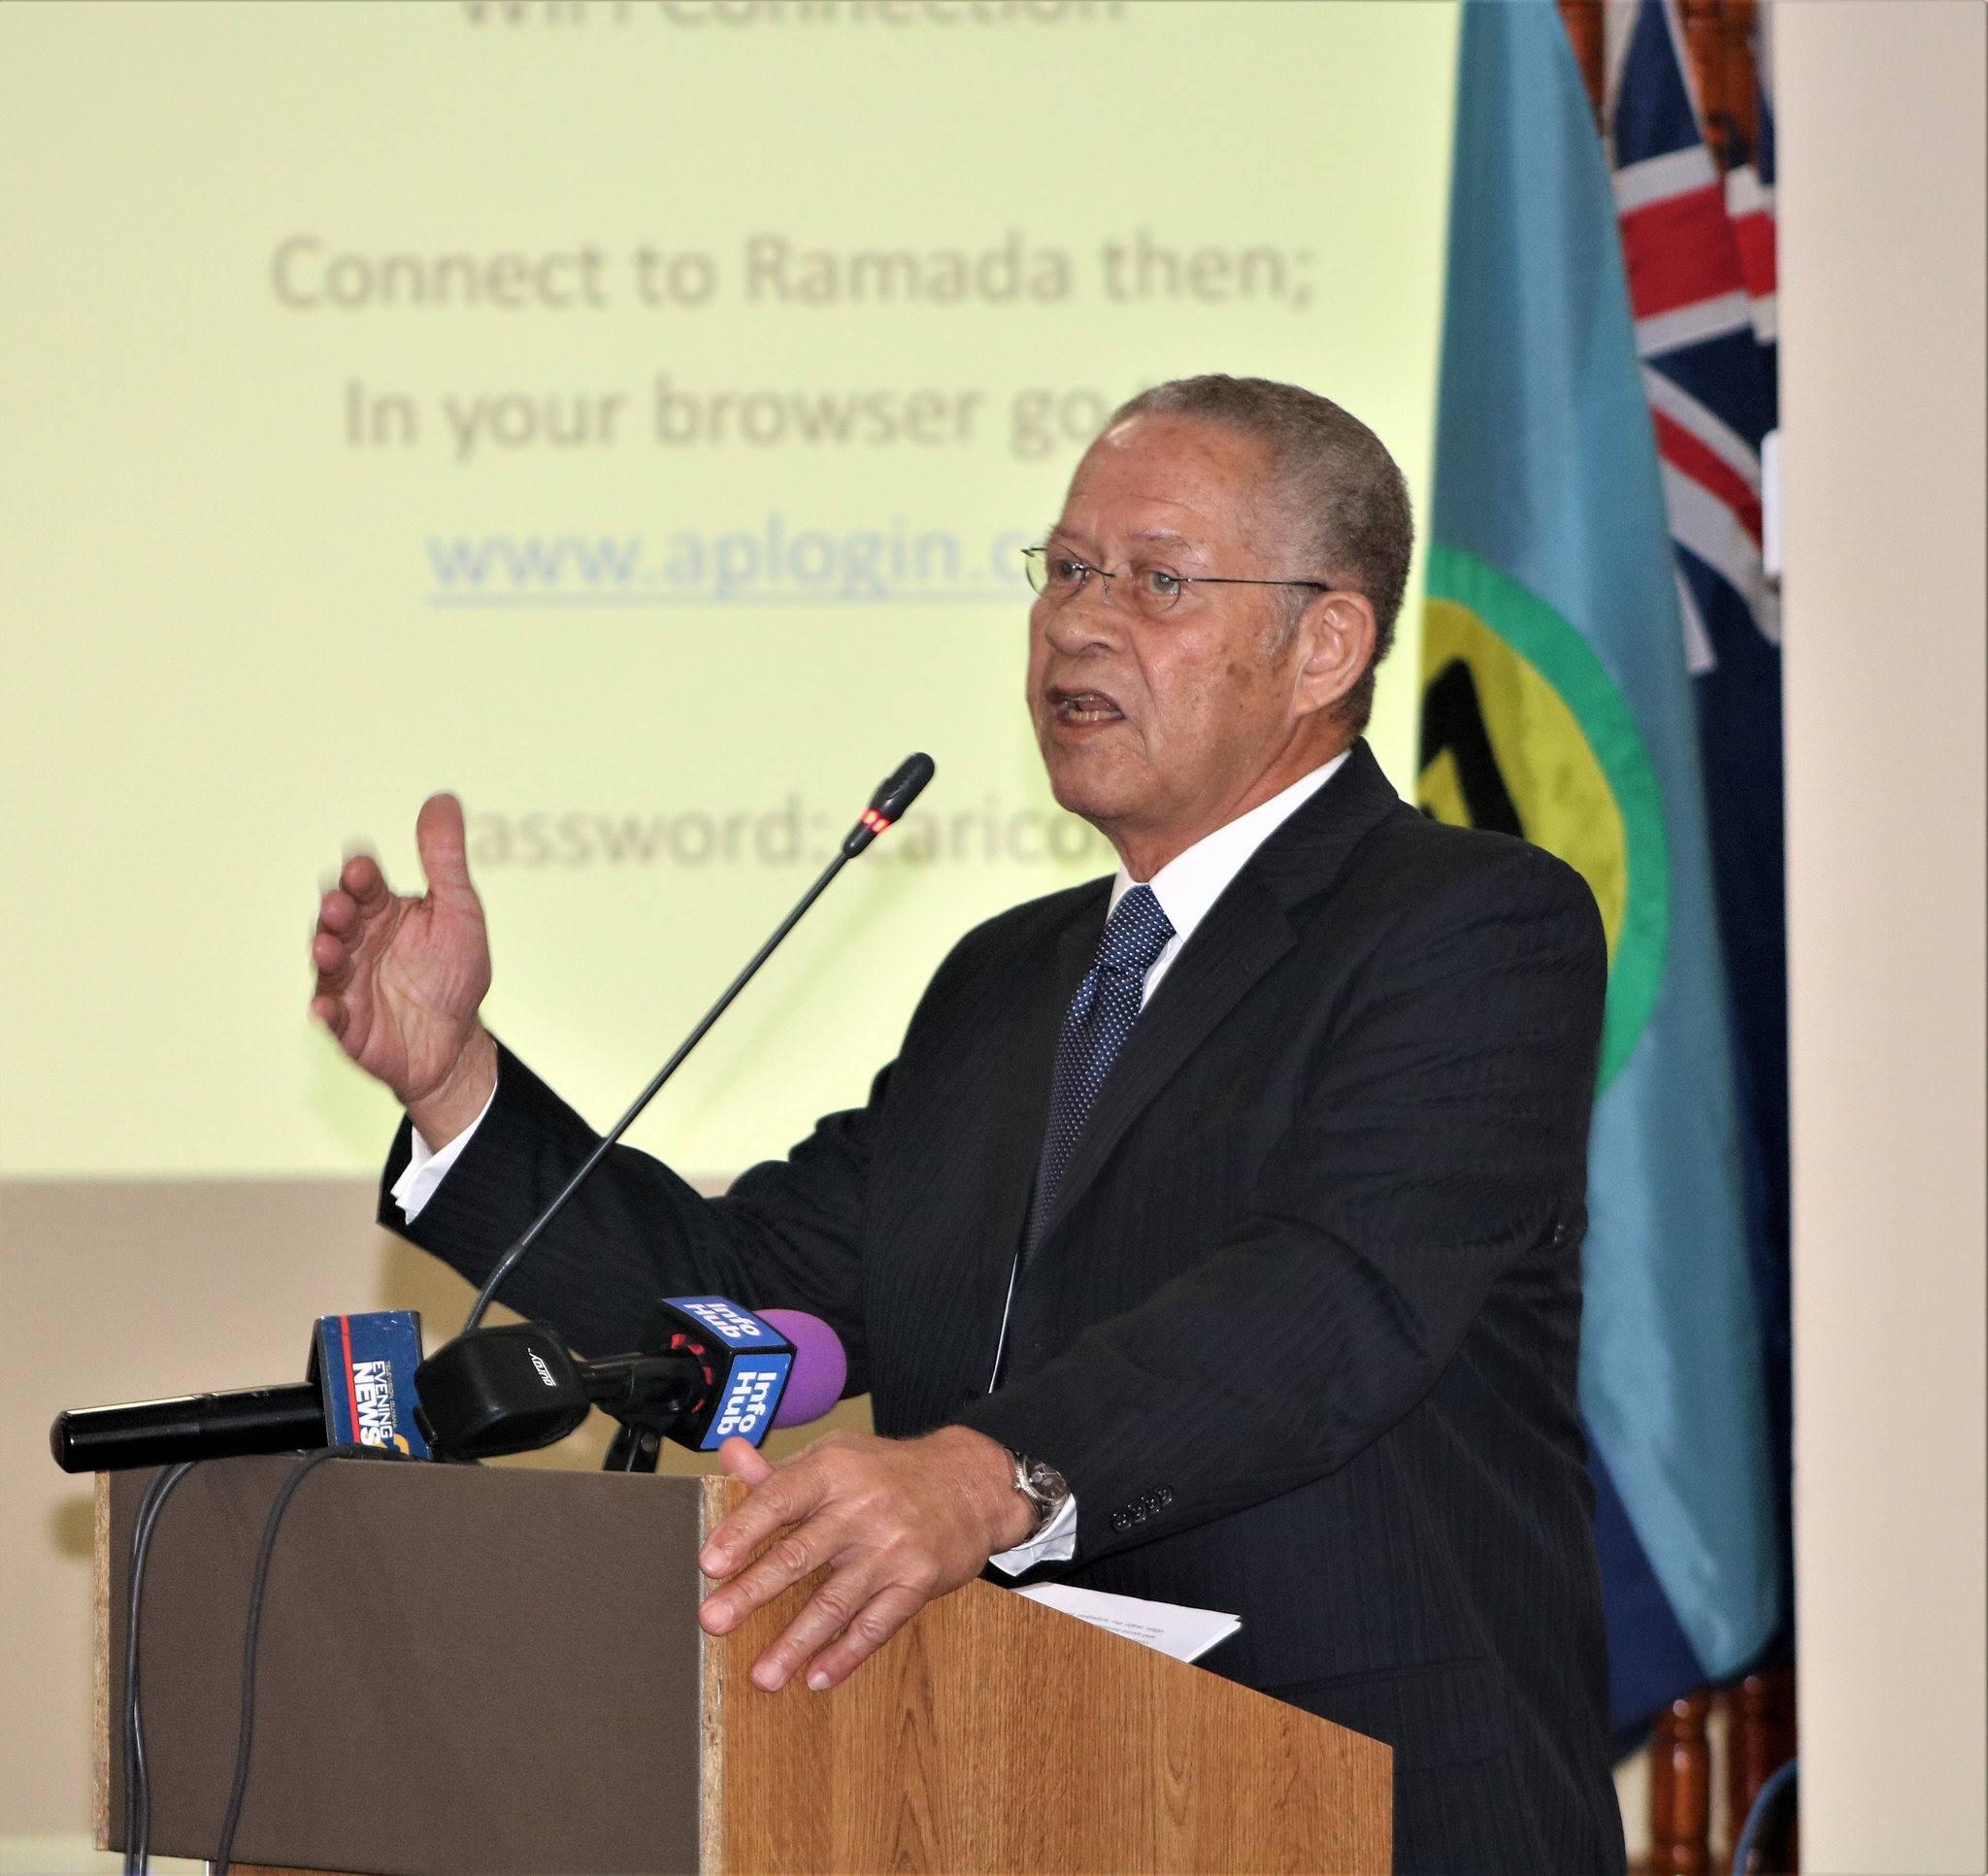 Former Prime Minister of Jamaica, Mr. Bruce Golding